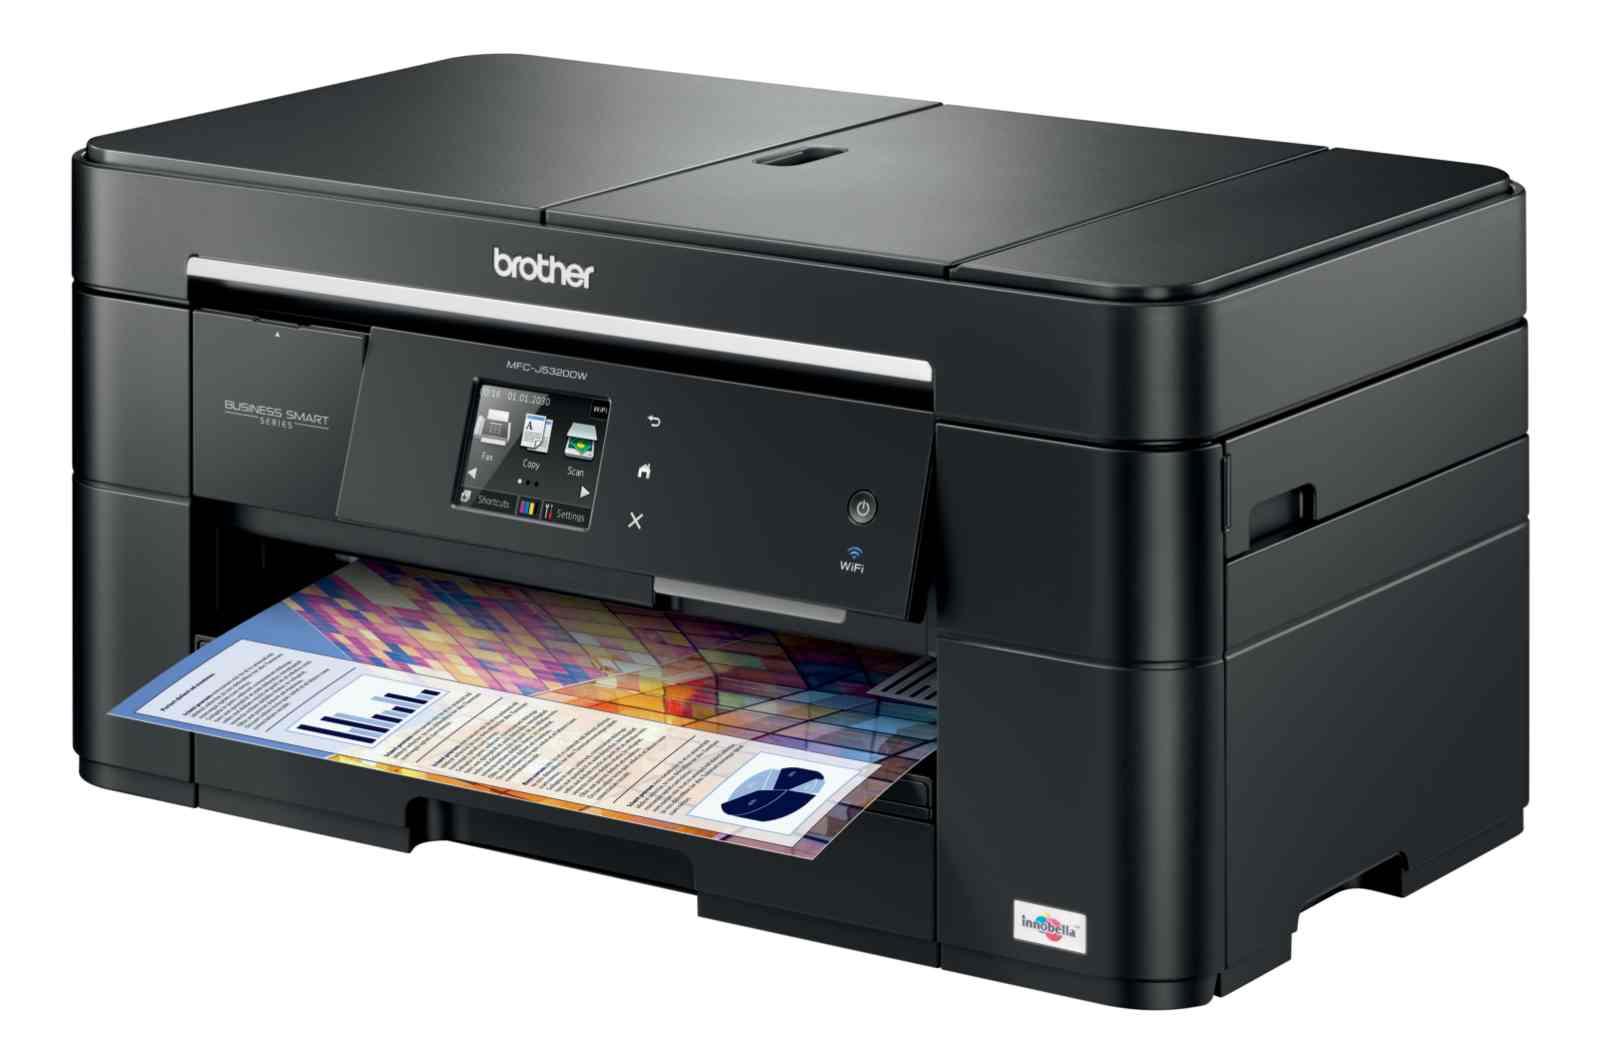 BROTHER multifunkce inkoustová MFC-J5320DWYJ1 - A3, A4 sken, 35ppm, 128MB, 1200x6000, USB, LAN, WiFi, duplex, ADF, 250l